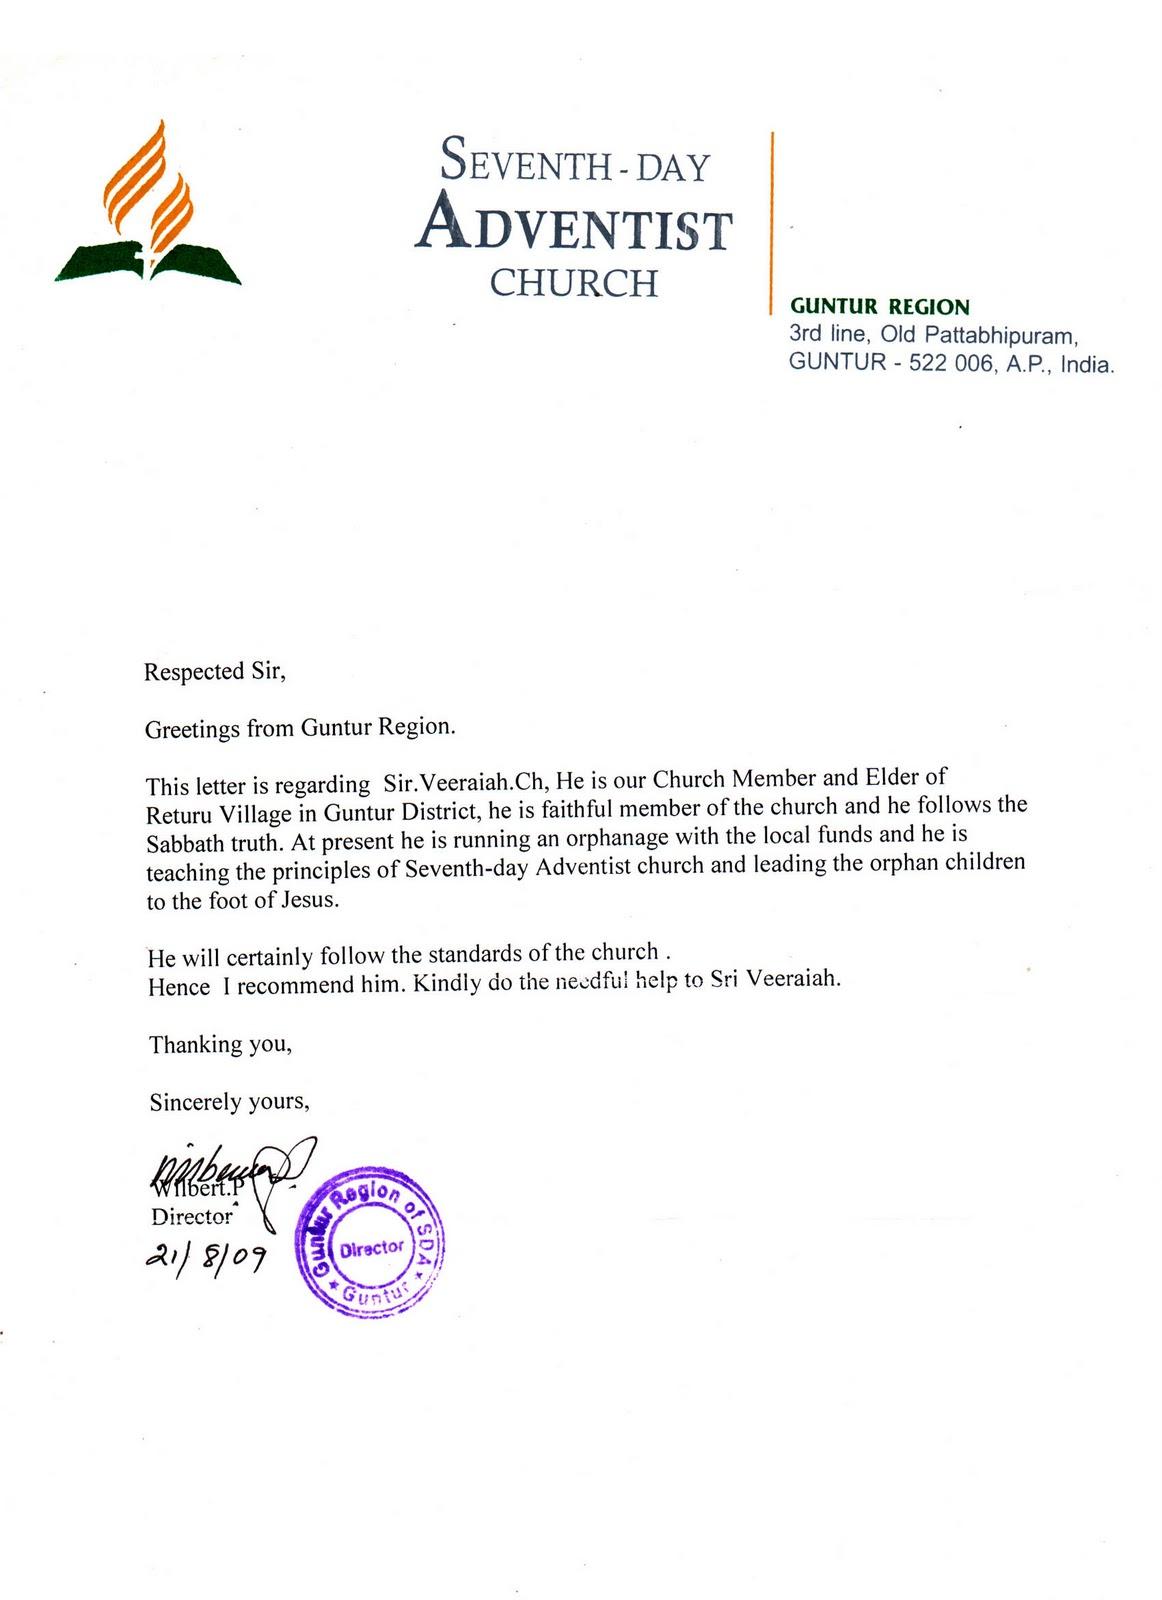 cover letter resigning letters resignation work resignation ...